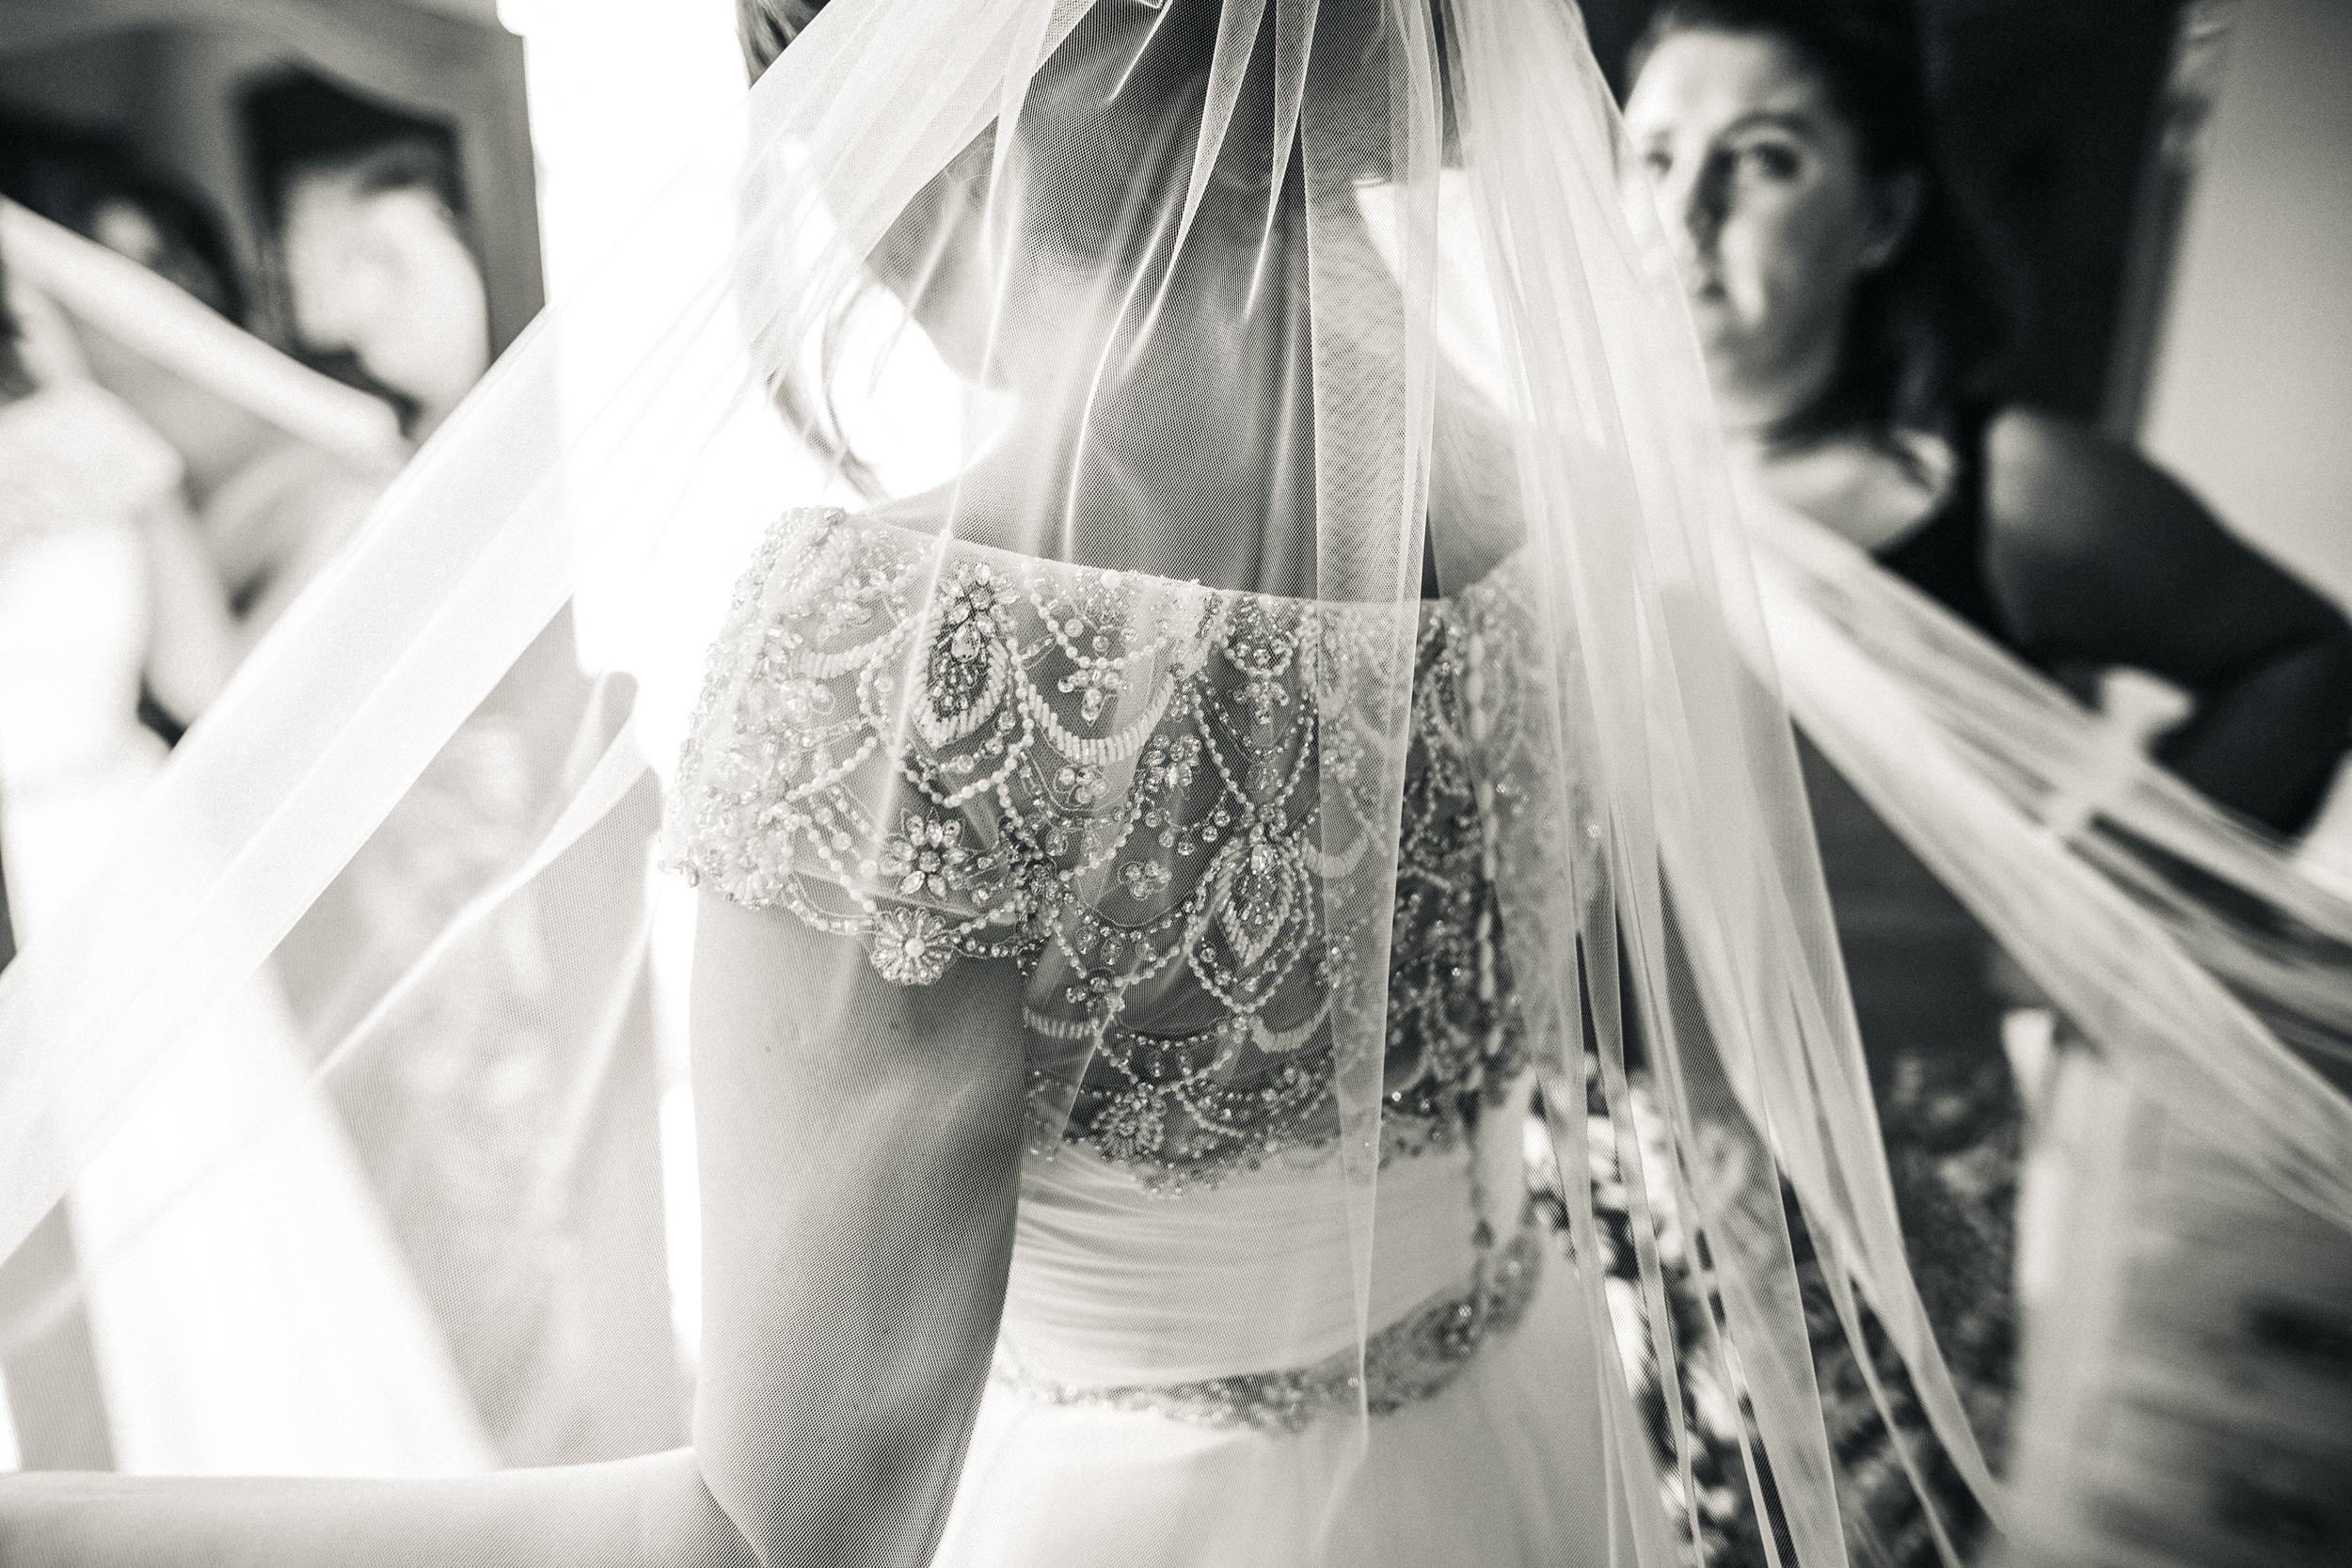 creative-wedding-photography-teesside-north-east-yorkshire-101.jpg